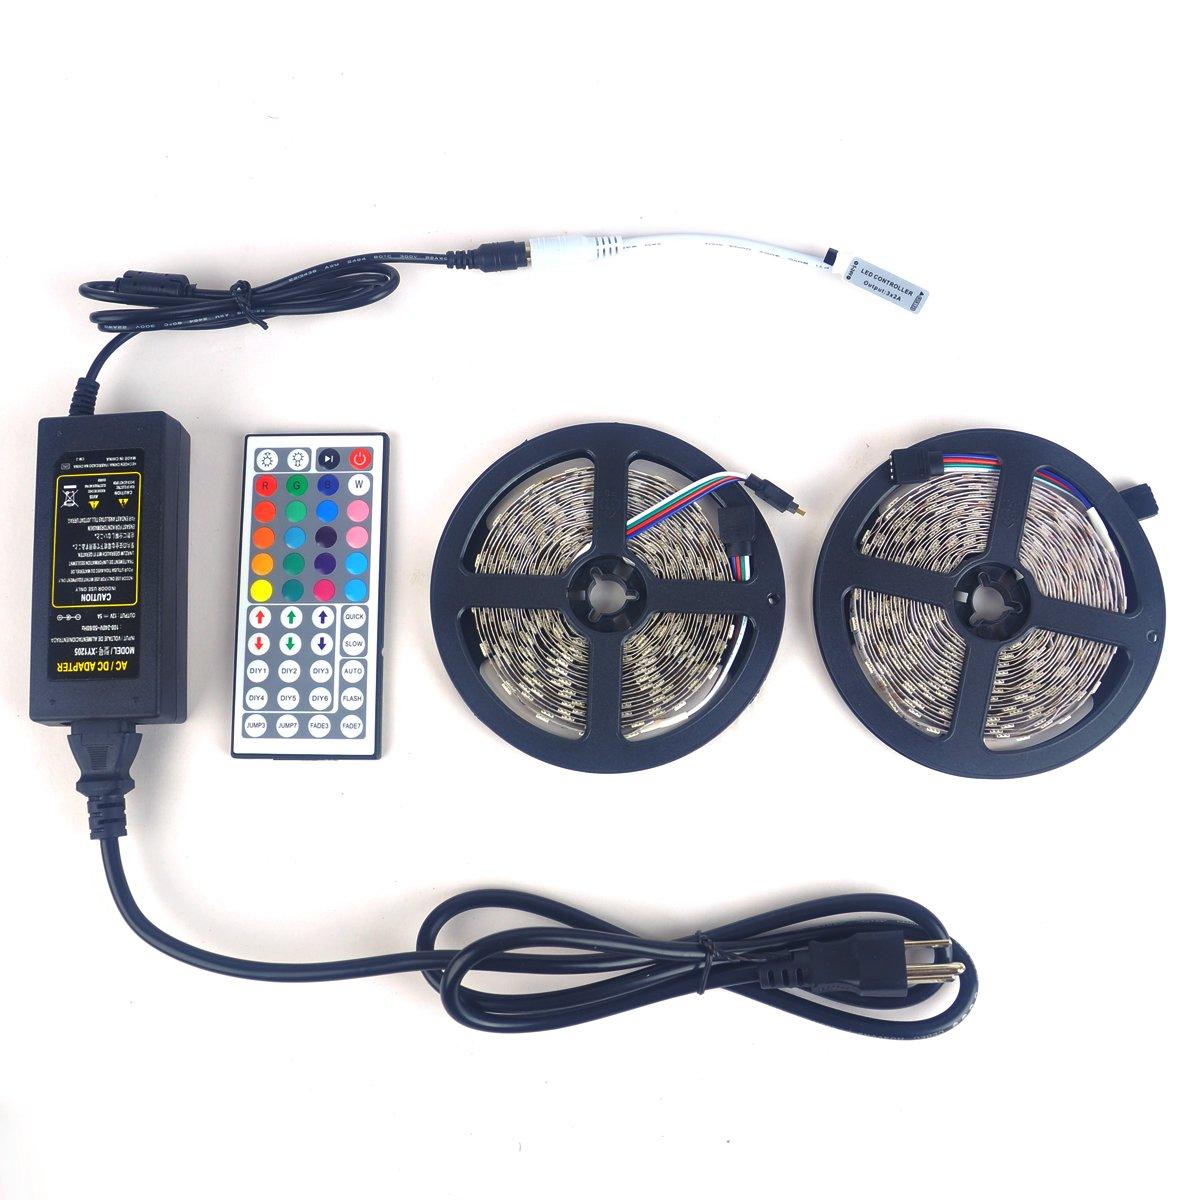 LTROP 2 Rolls 32.8ft LED Strip Lights Kit, None-waterproof Flexible SMD 5050 RGB 600 LED Light Strips with Mini 44 Key Remote and 12V 5V Power Adapter LED Strip Lights Kit-LT0028